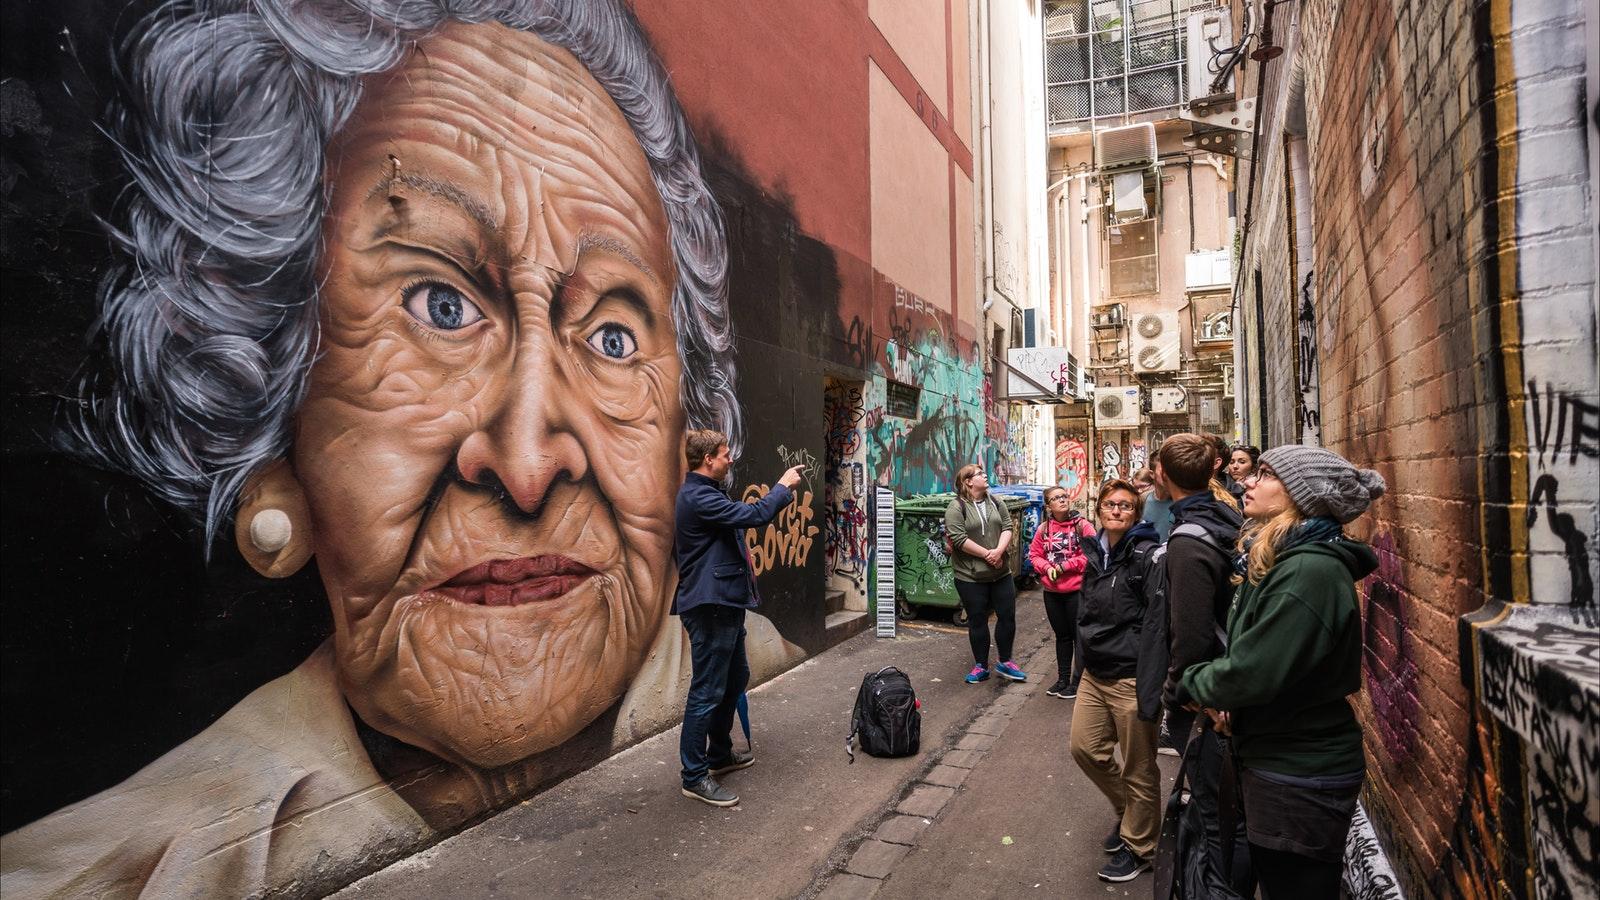 John profiles Melbourne's street art on the Walks 101 Free Walking Tour